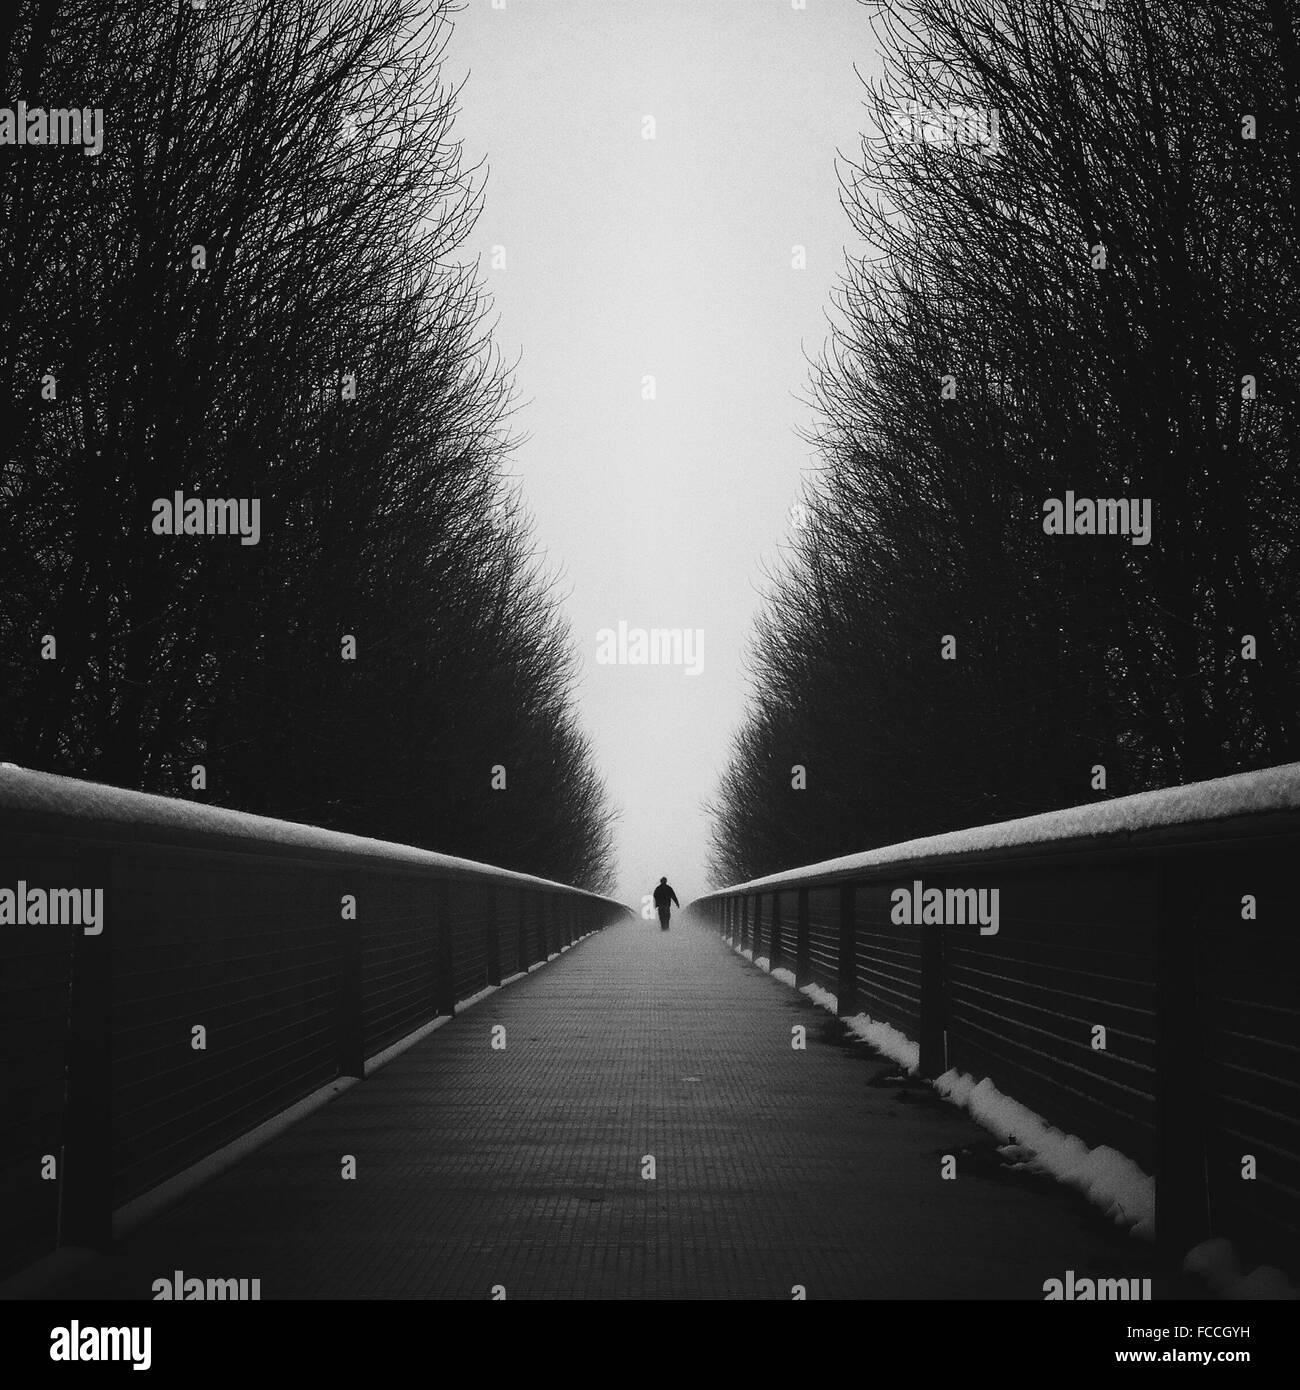 Person Walking On Footbridge Amidst Trees - Stock Image